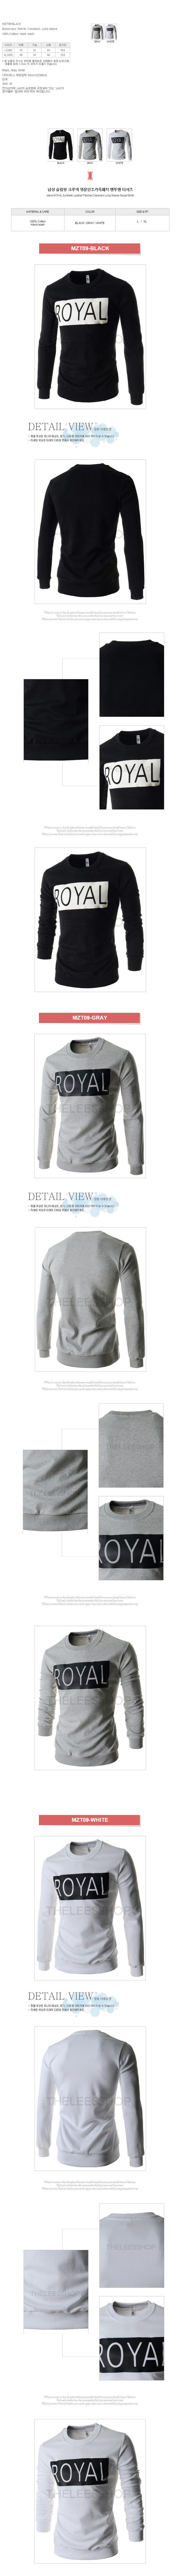 [ KOOLLOOK ] [KoolLook] Two-Tone Printed Sweatshirt MZT09